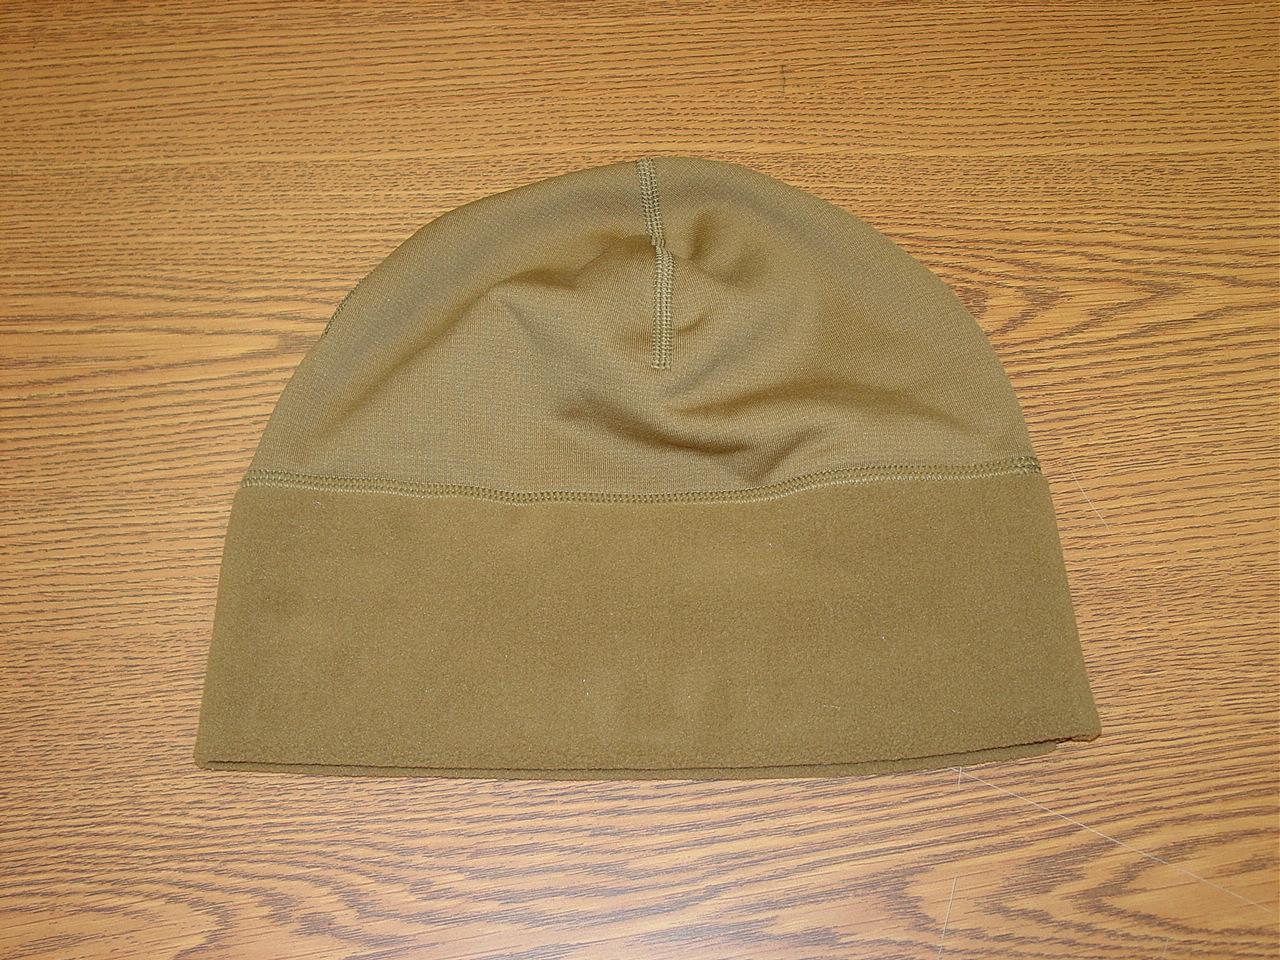 Marine Corps MCWCS Hardface Micro Fleece Cap - CIE Hub 2b38167580a